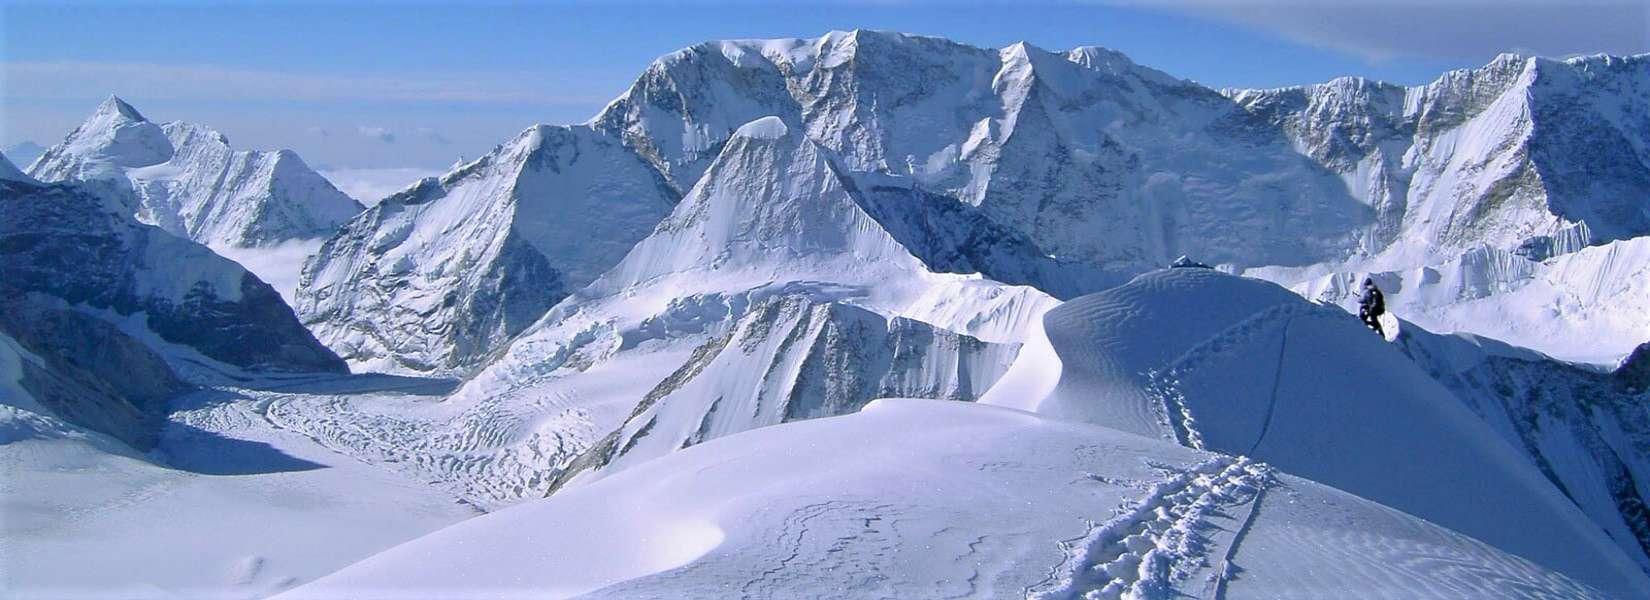 Mera peak climbing experience